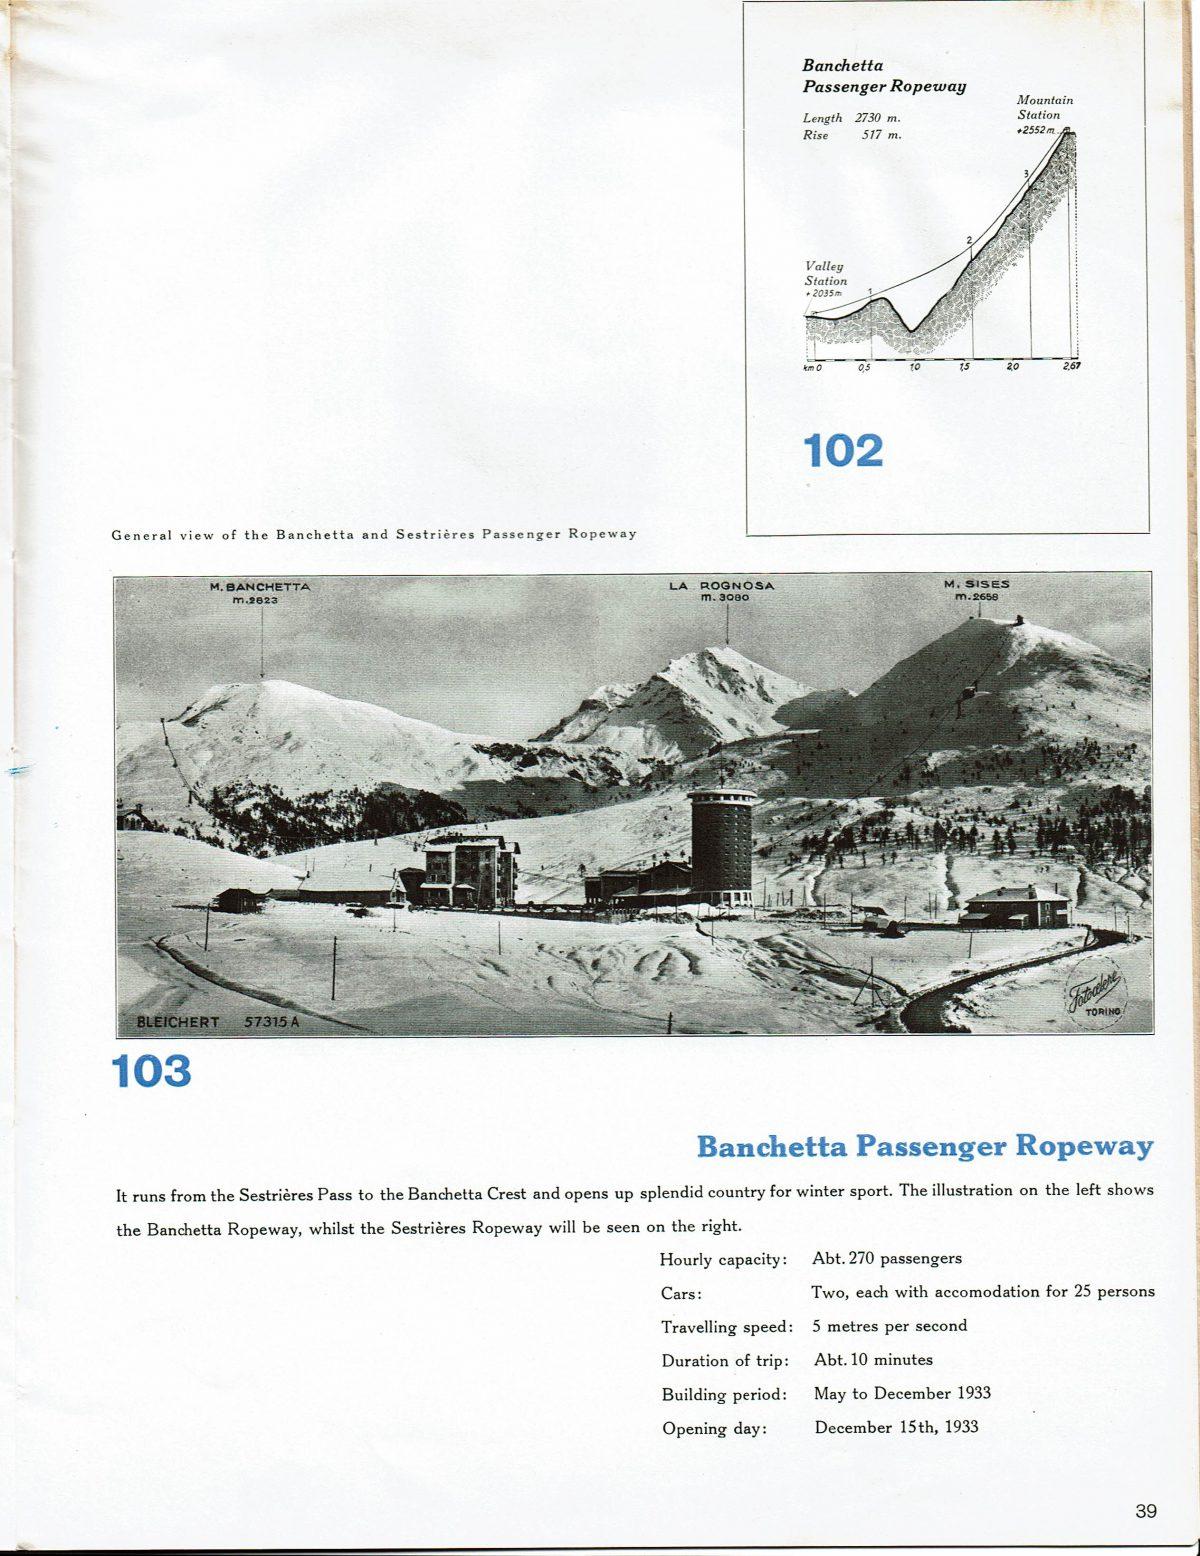 1933 Bleichert Passenger Arial Ropeways 34